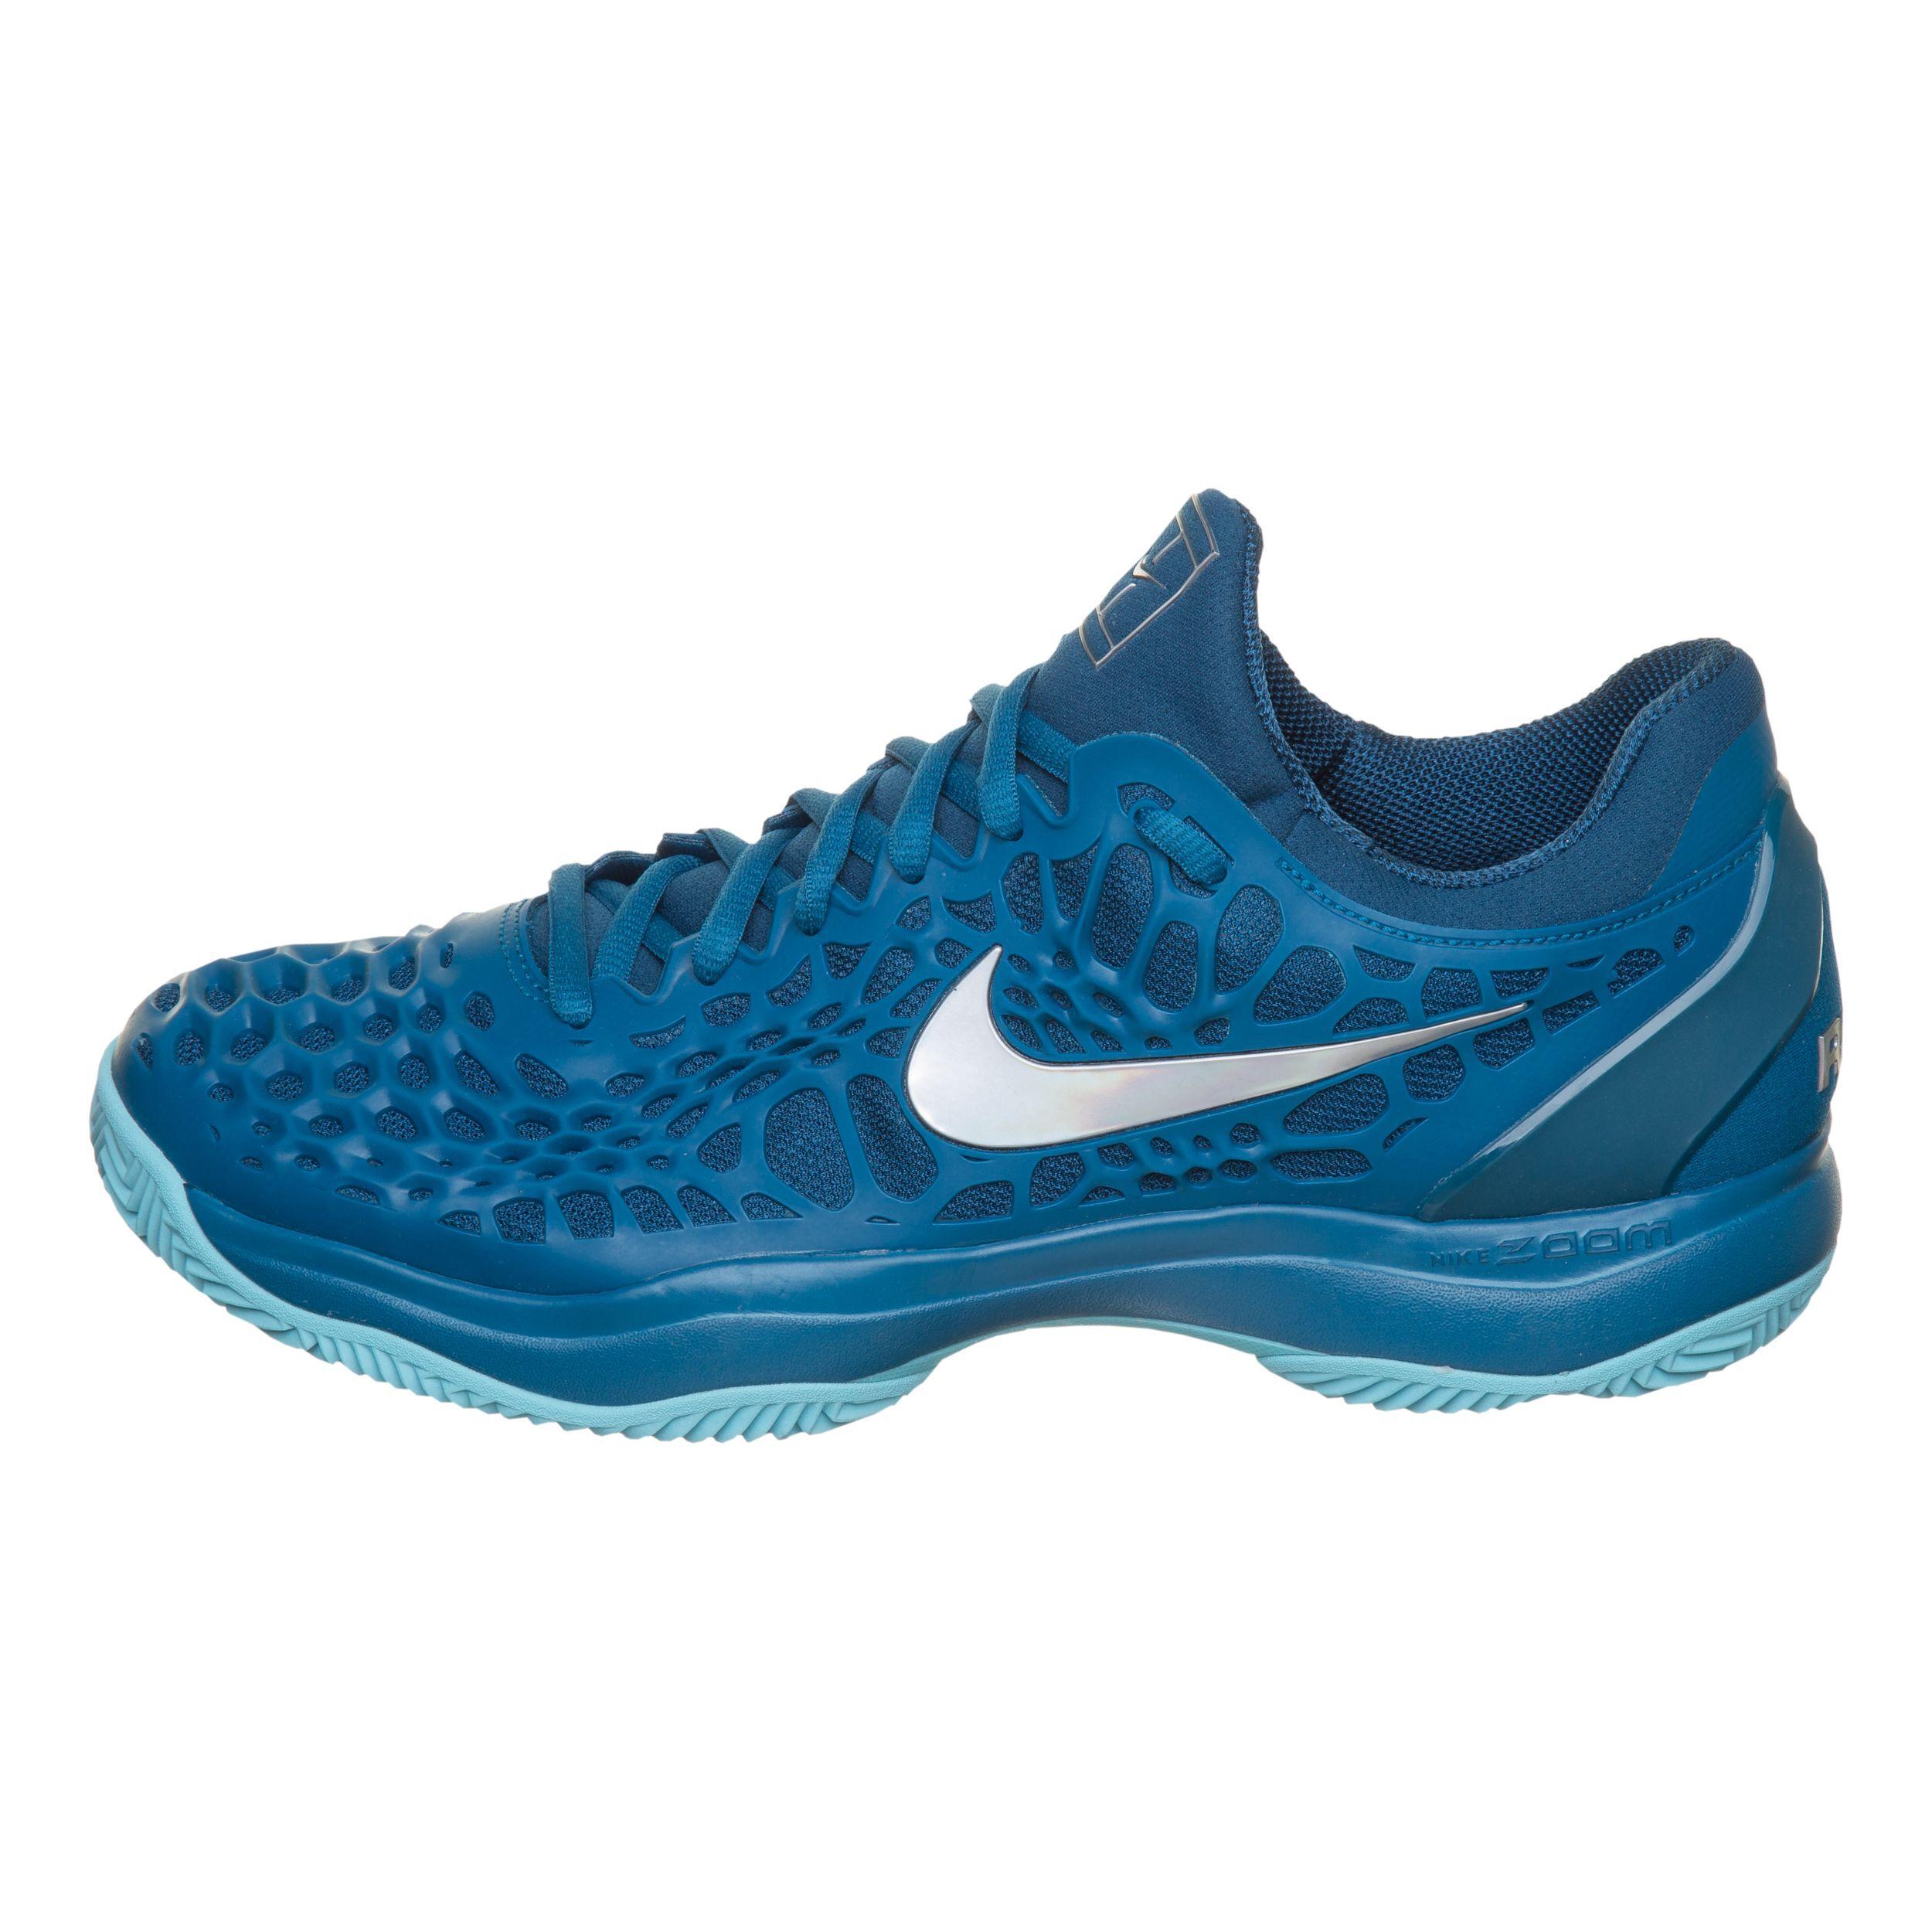 buy Nike Zoom Cage 3 Clay Court Shoe Men - Blue, Light Blue online ...